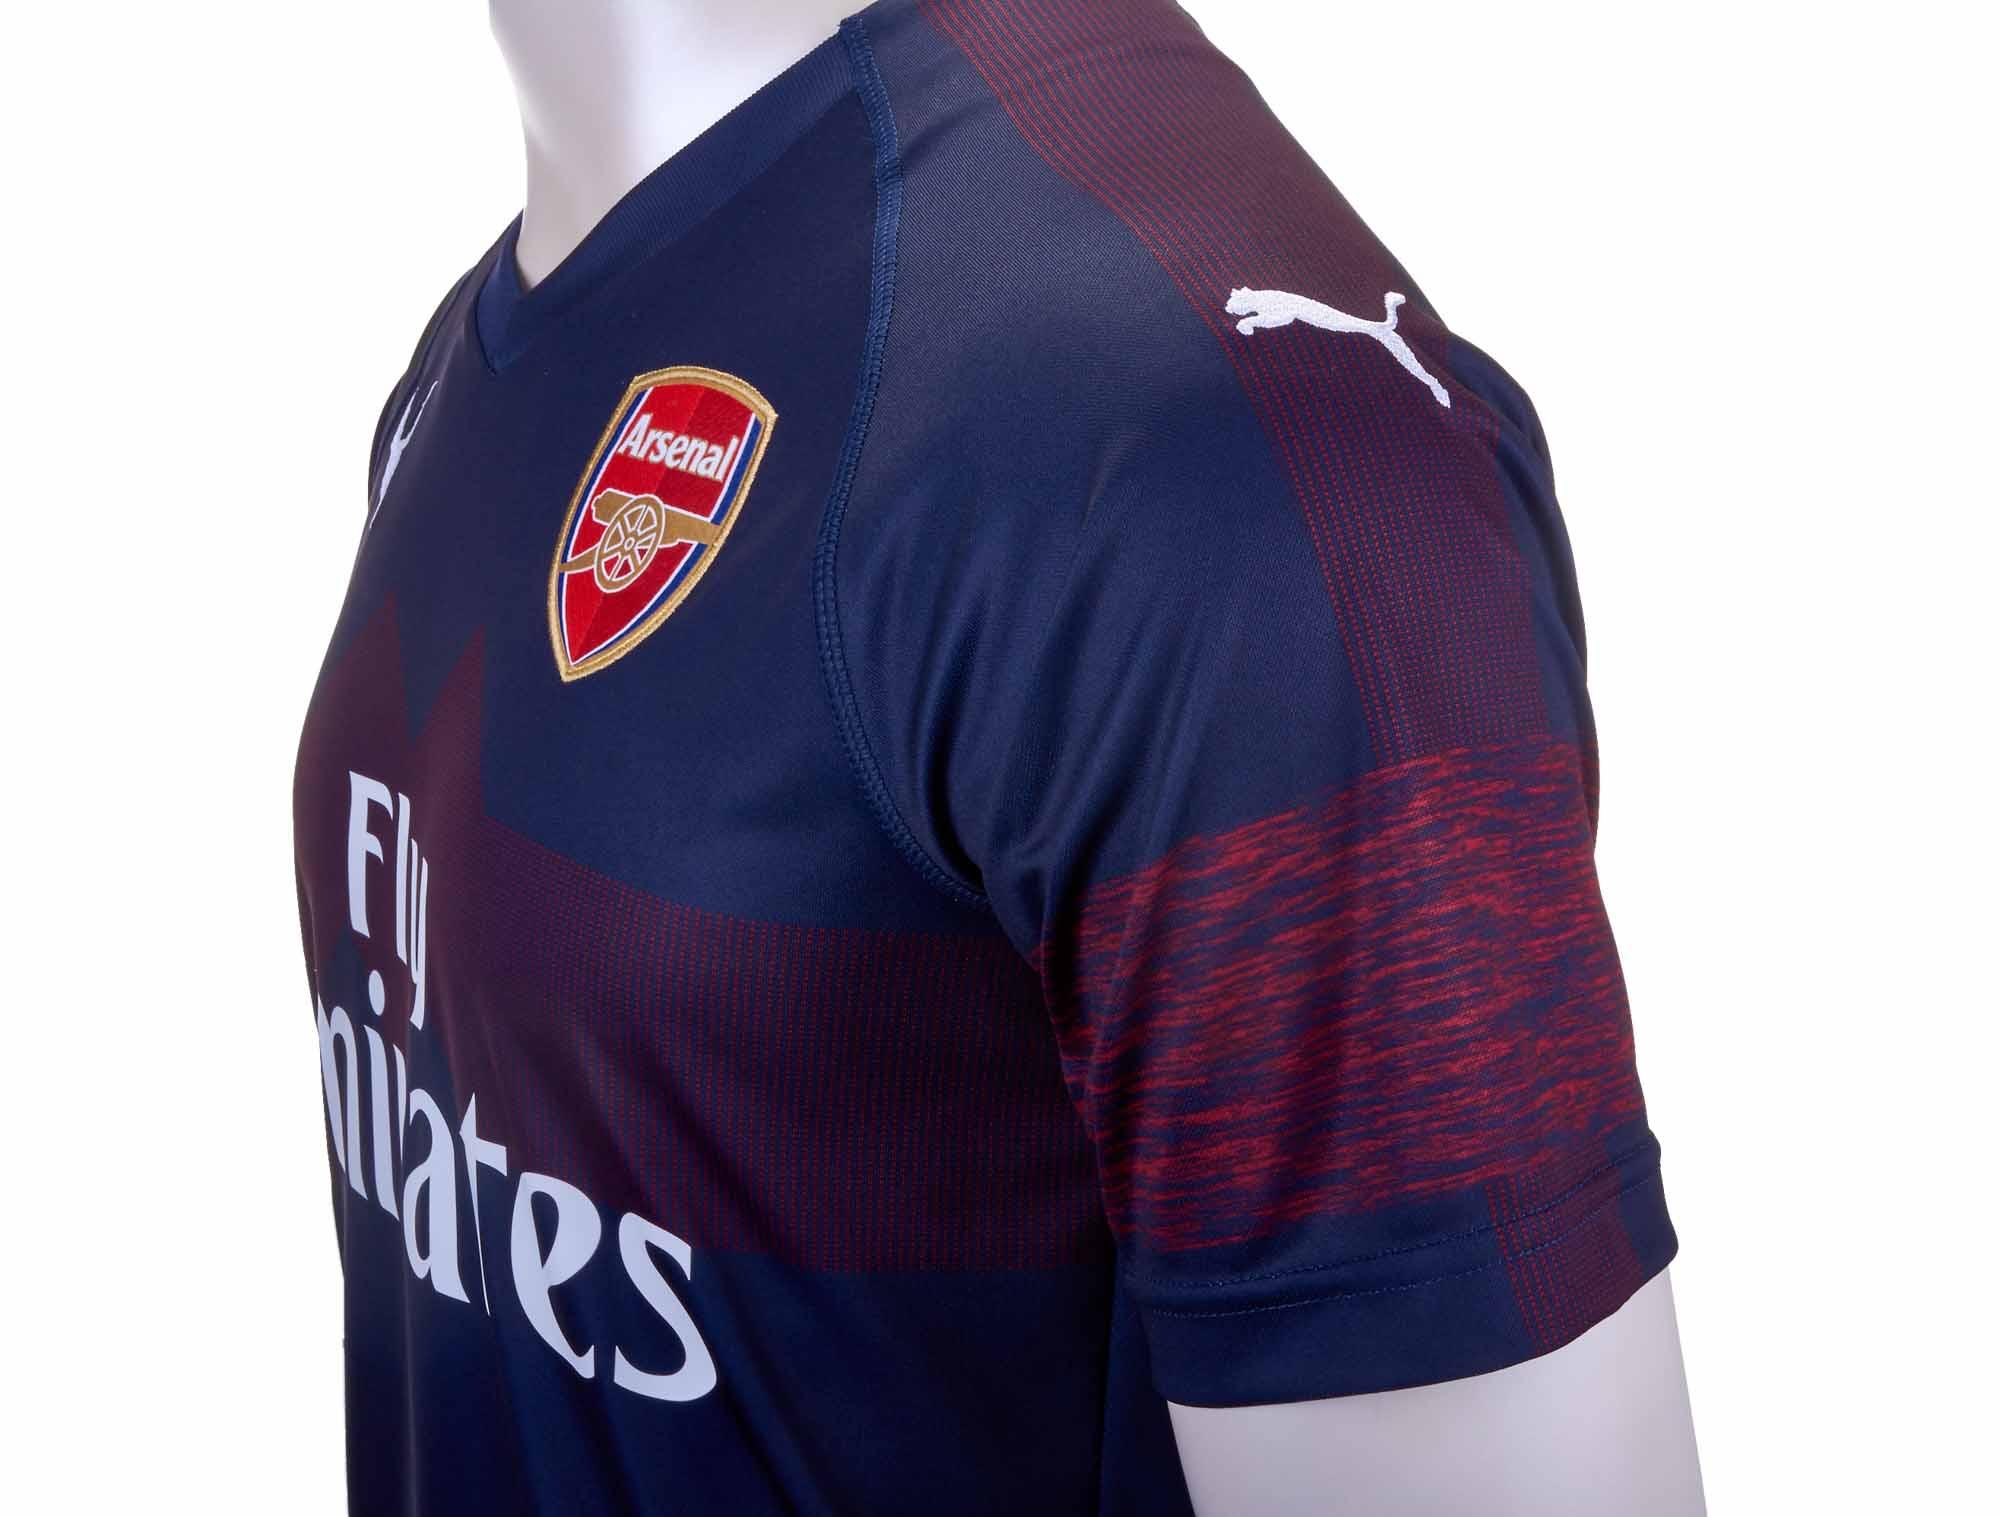 meet 10b23 87952 2018/19 PUMA Aaron Ramsey Arsenal Away Jersey - SoccerPro